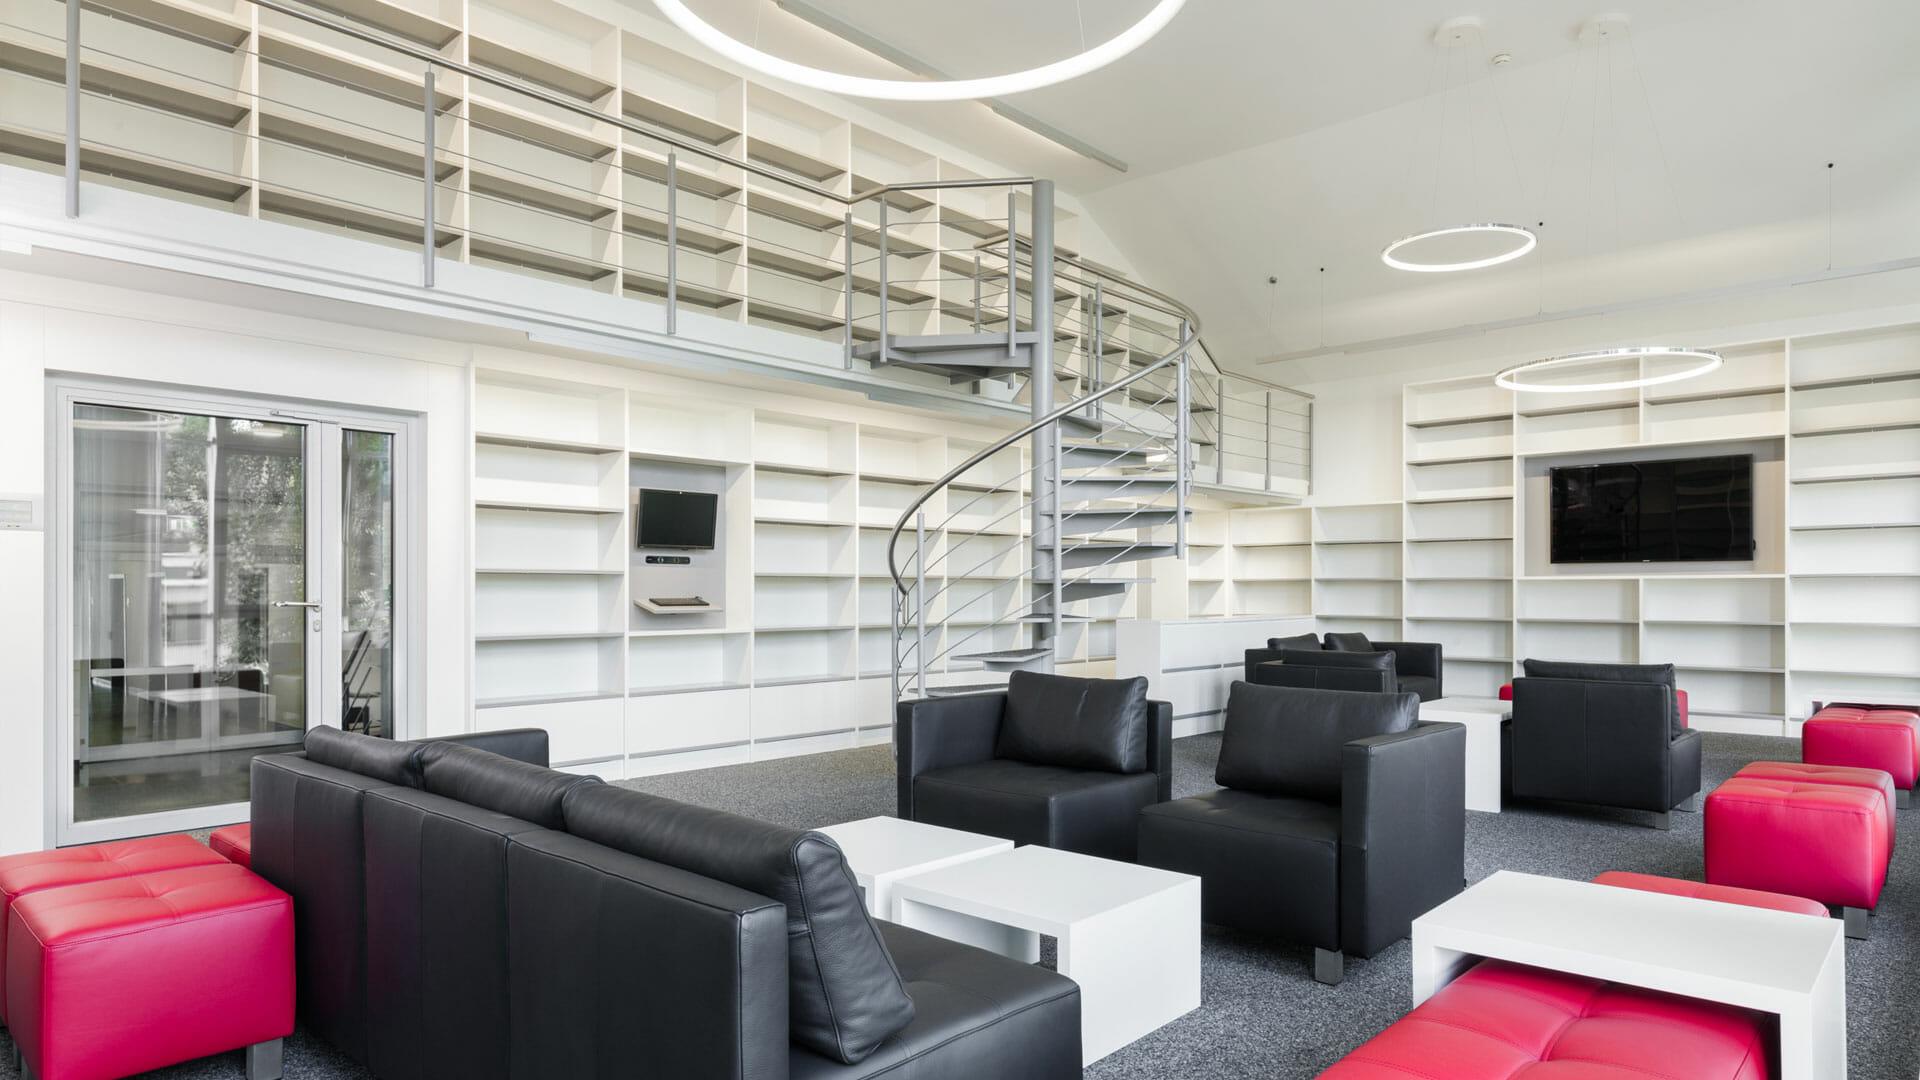 Bibliothek it Lesesesseln